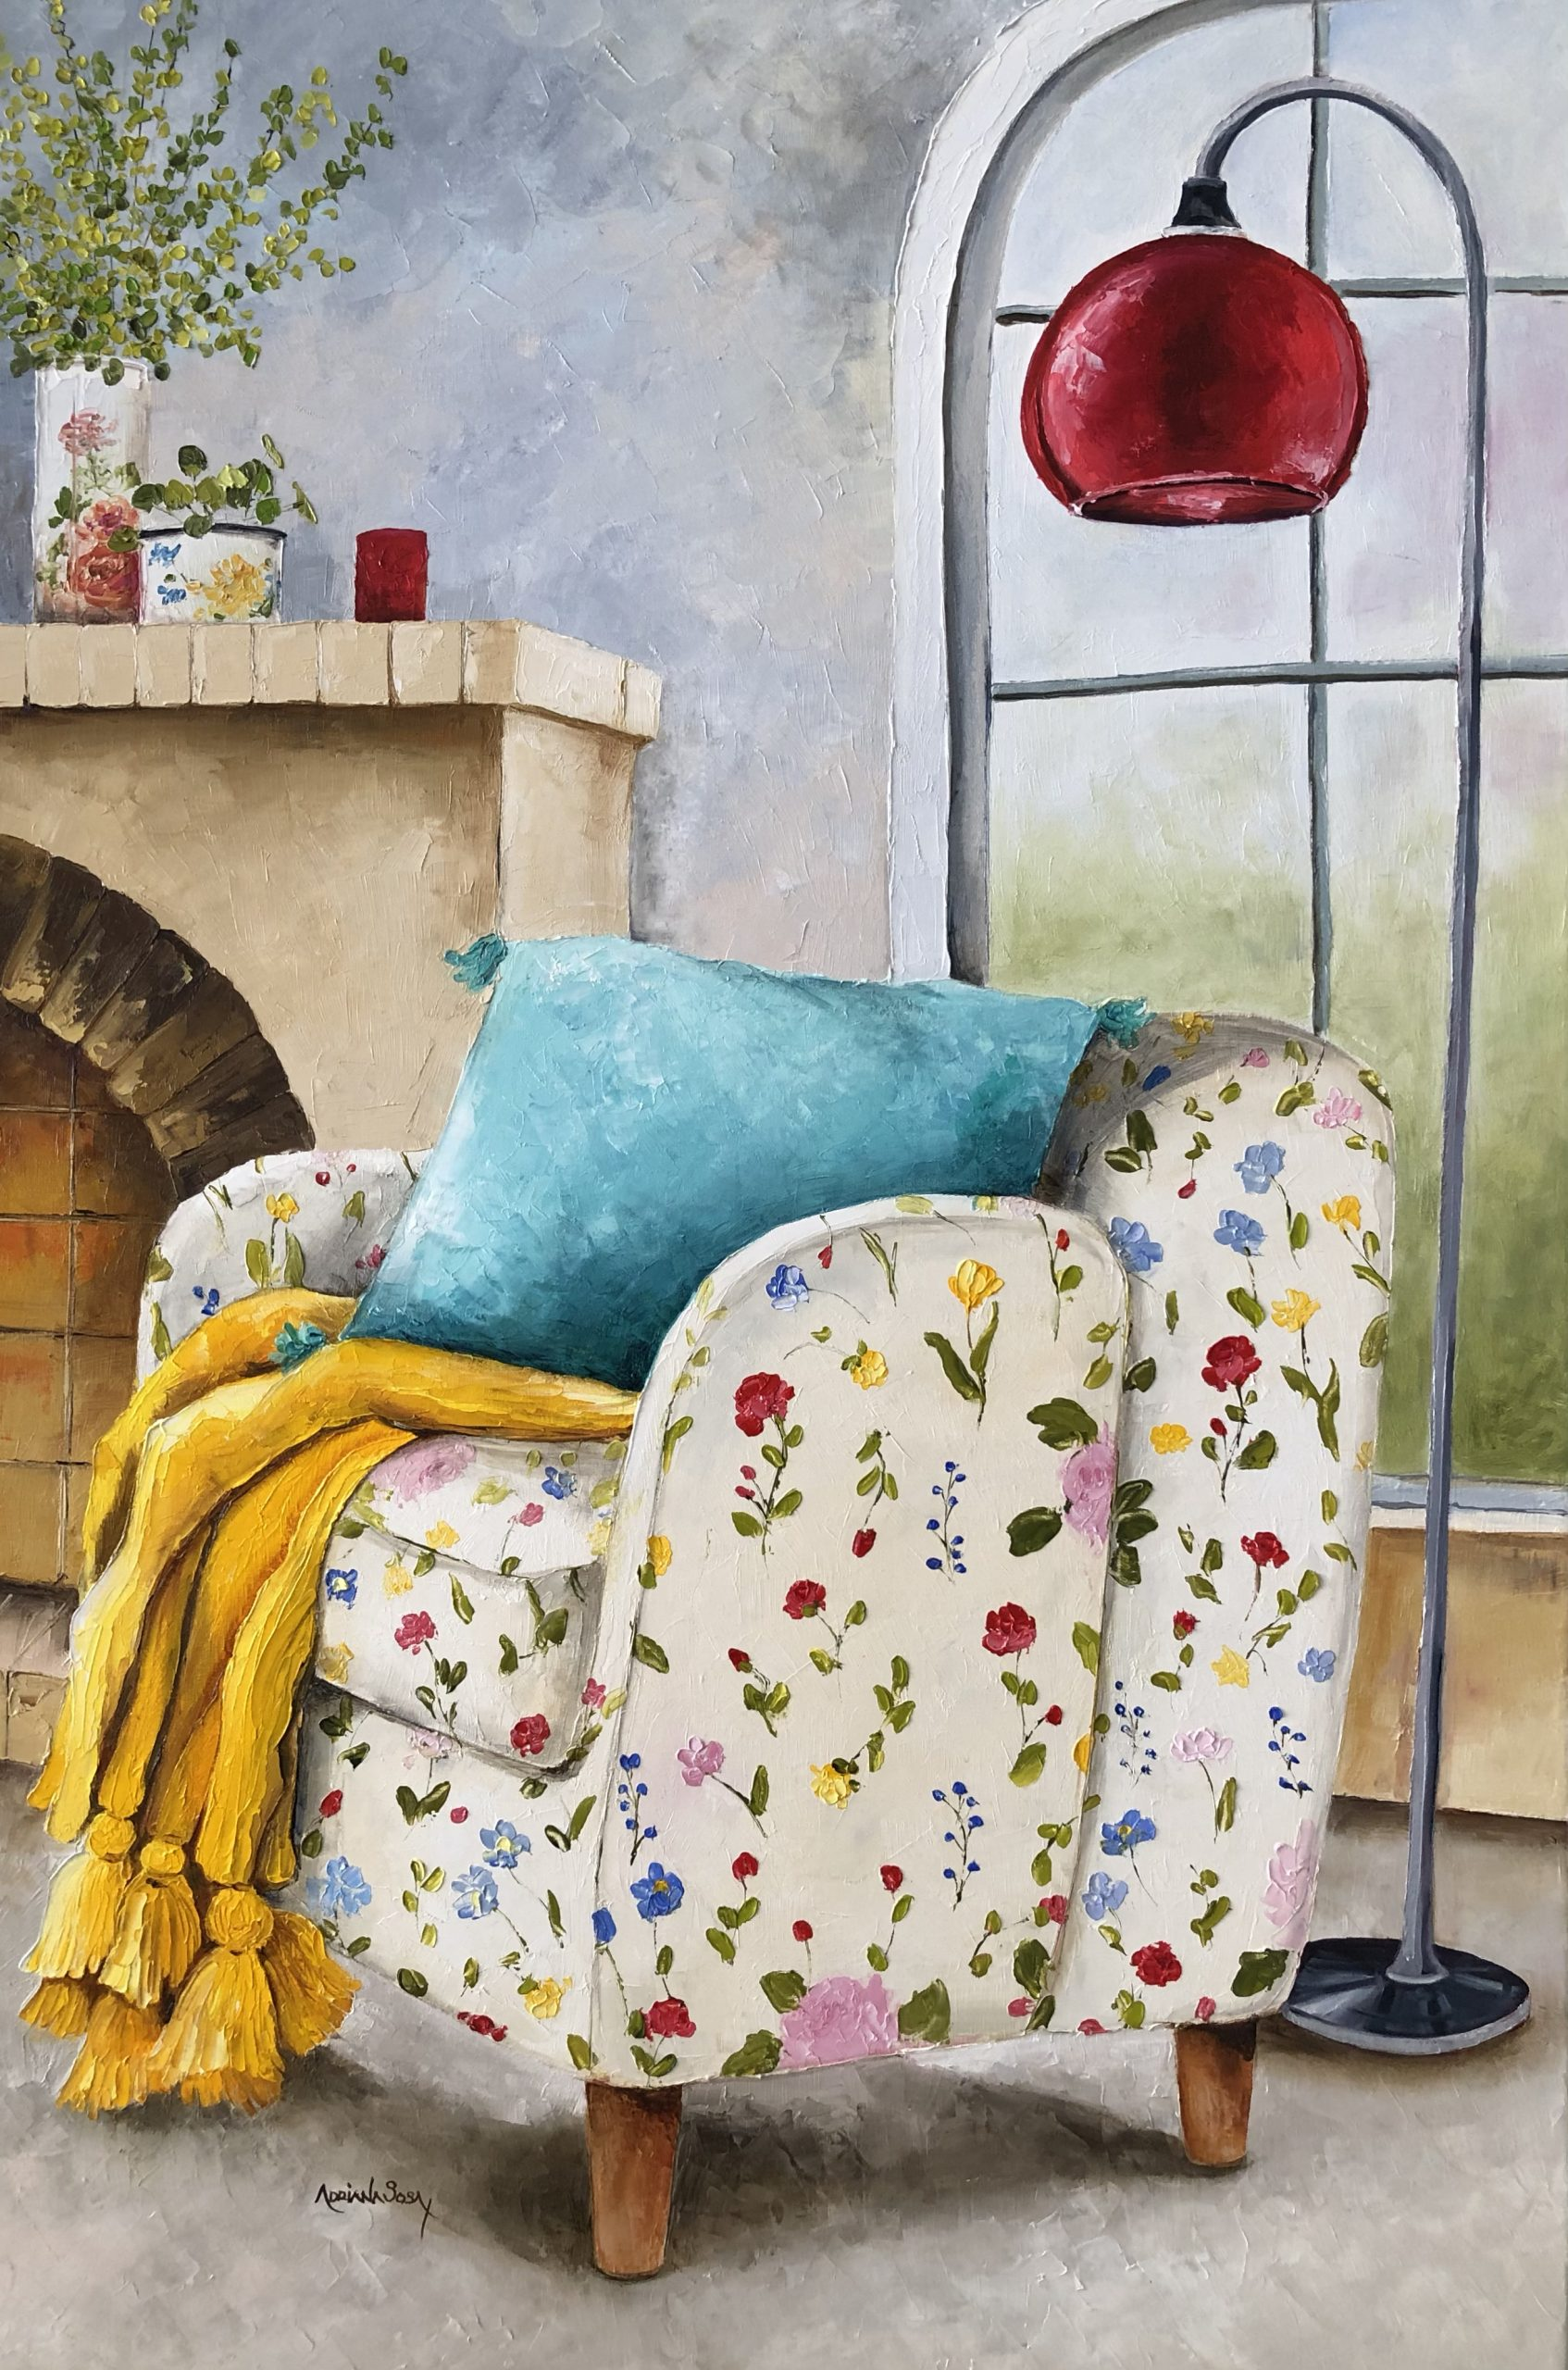 Clases de pintura al oleo pintura oleo arte lienzo aprende curso